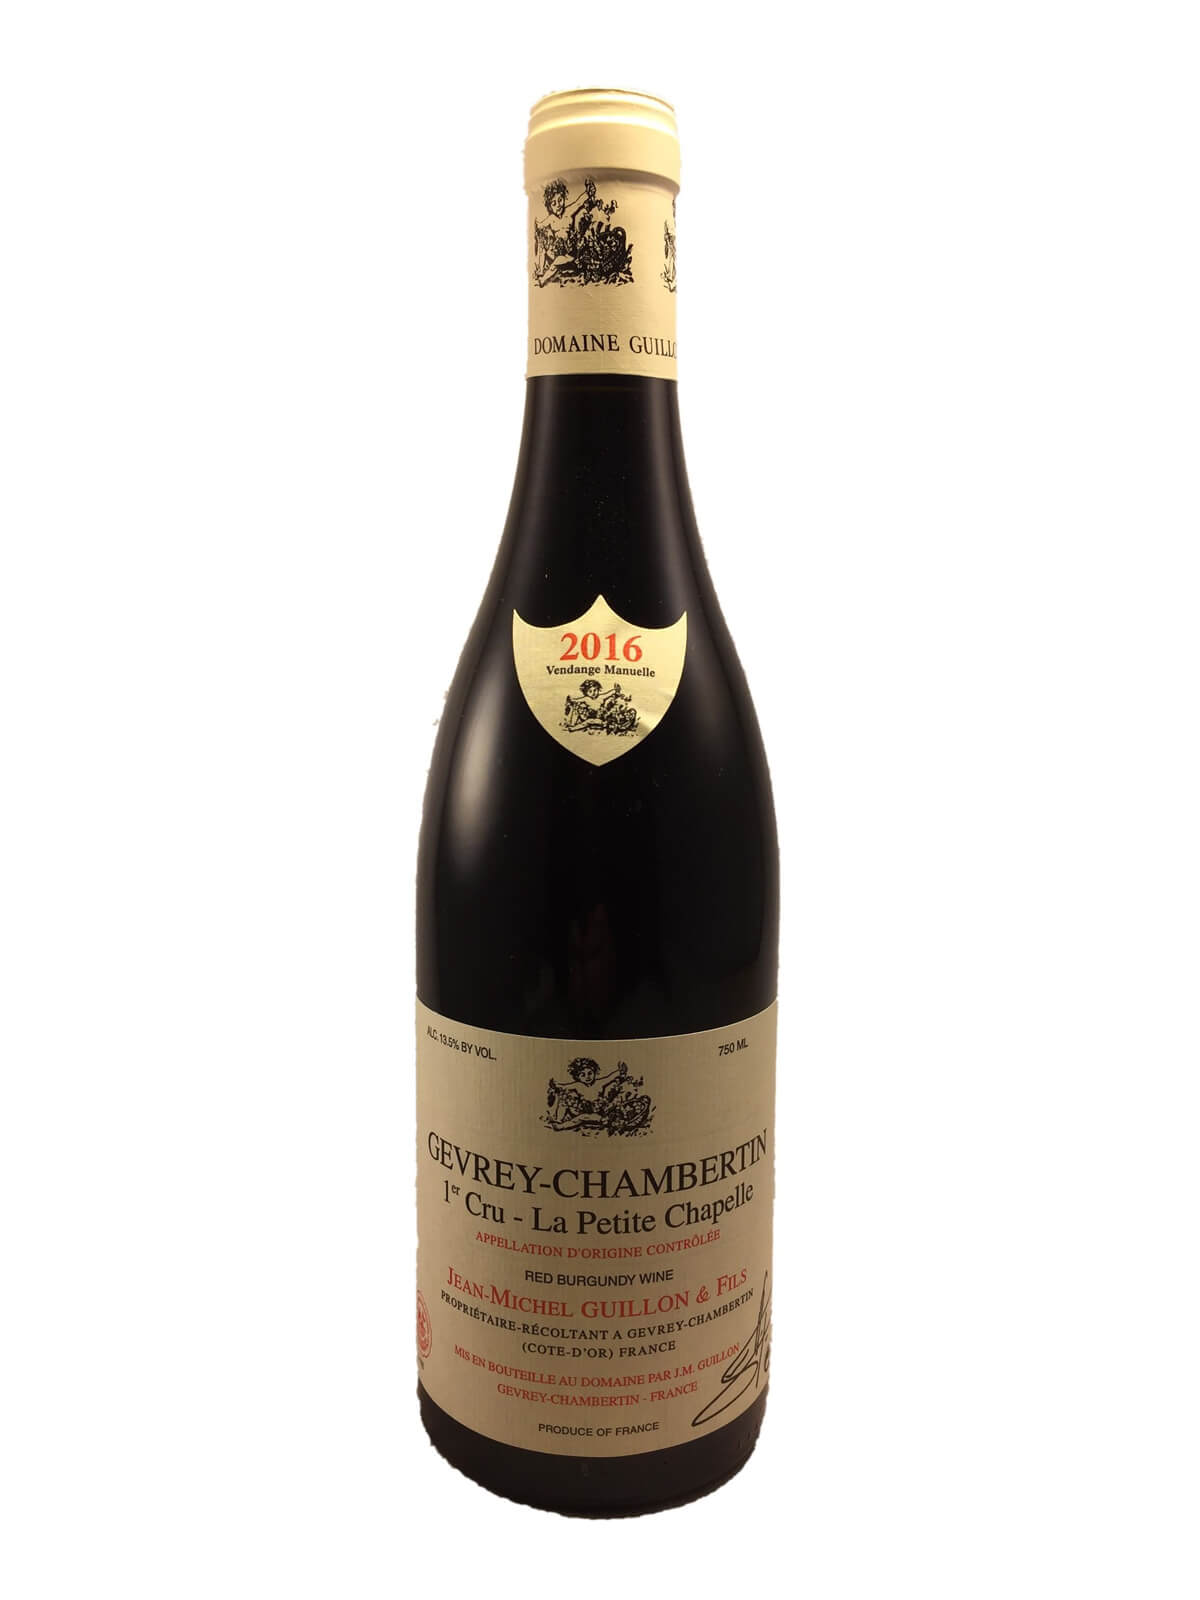 GEVREY CHAMBERTIN 1er cru La Petite Chapelle 2016 Domaine Jean Michel GUILLON